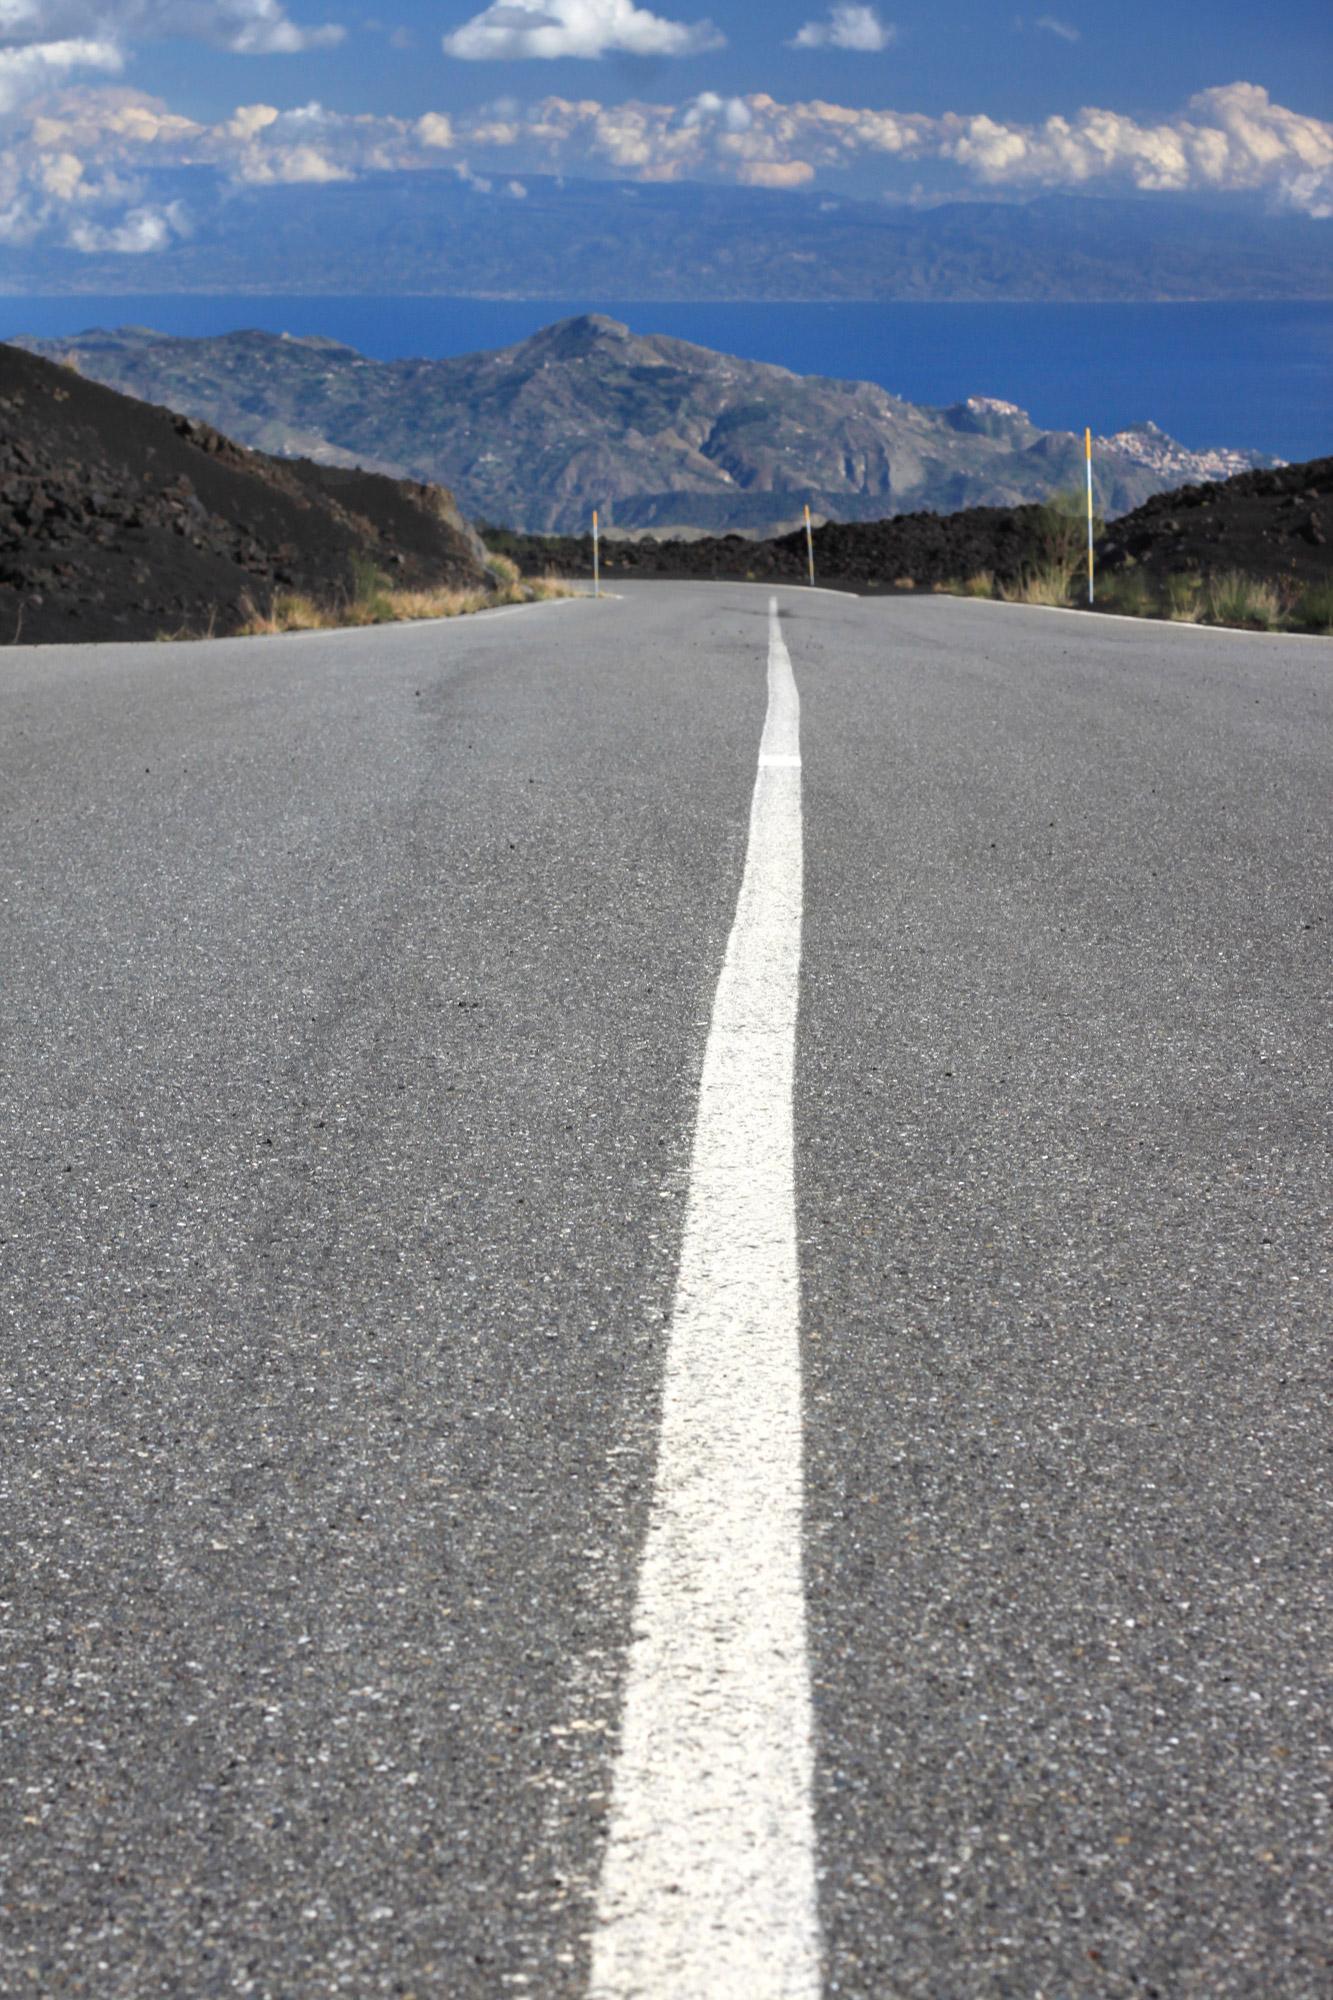 Road Serpentine Mount Etna